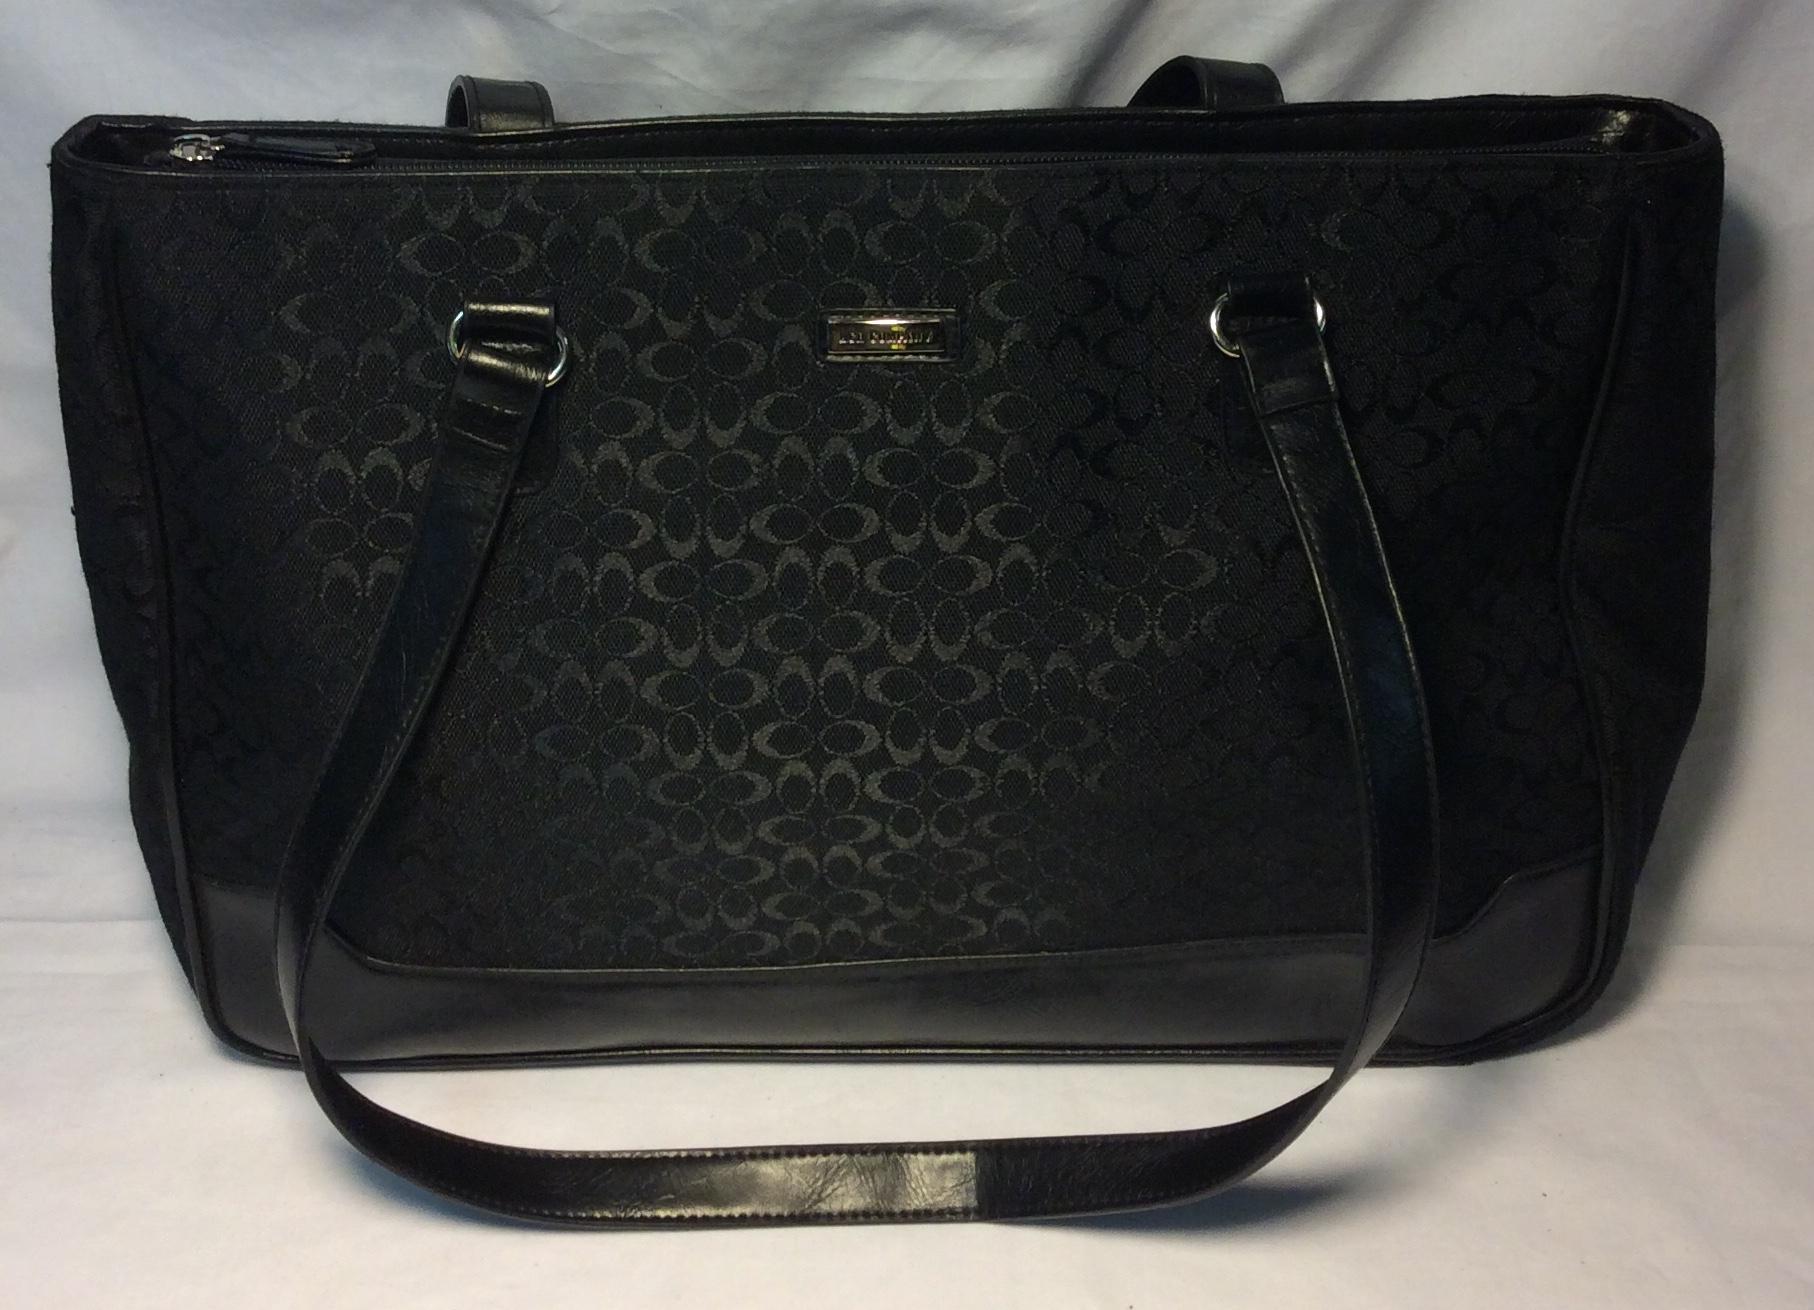 Black patterened purse